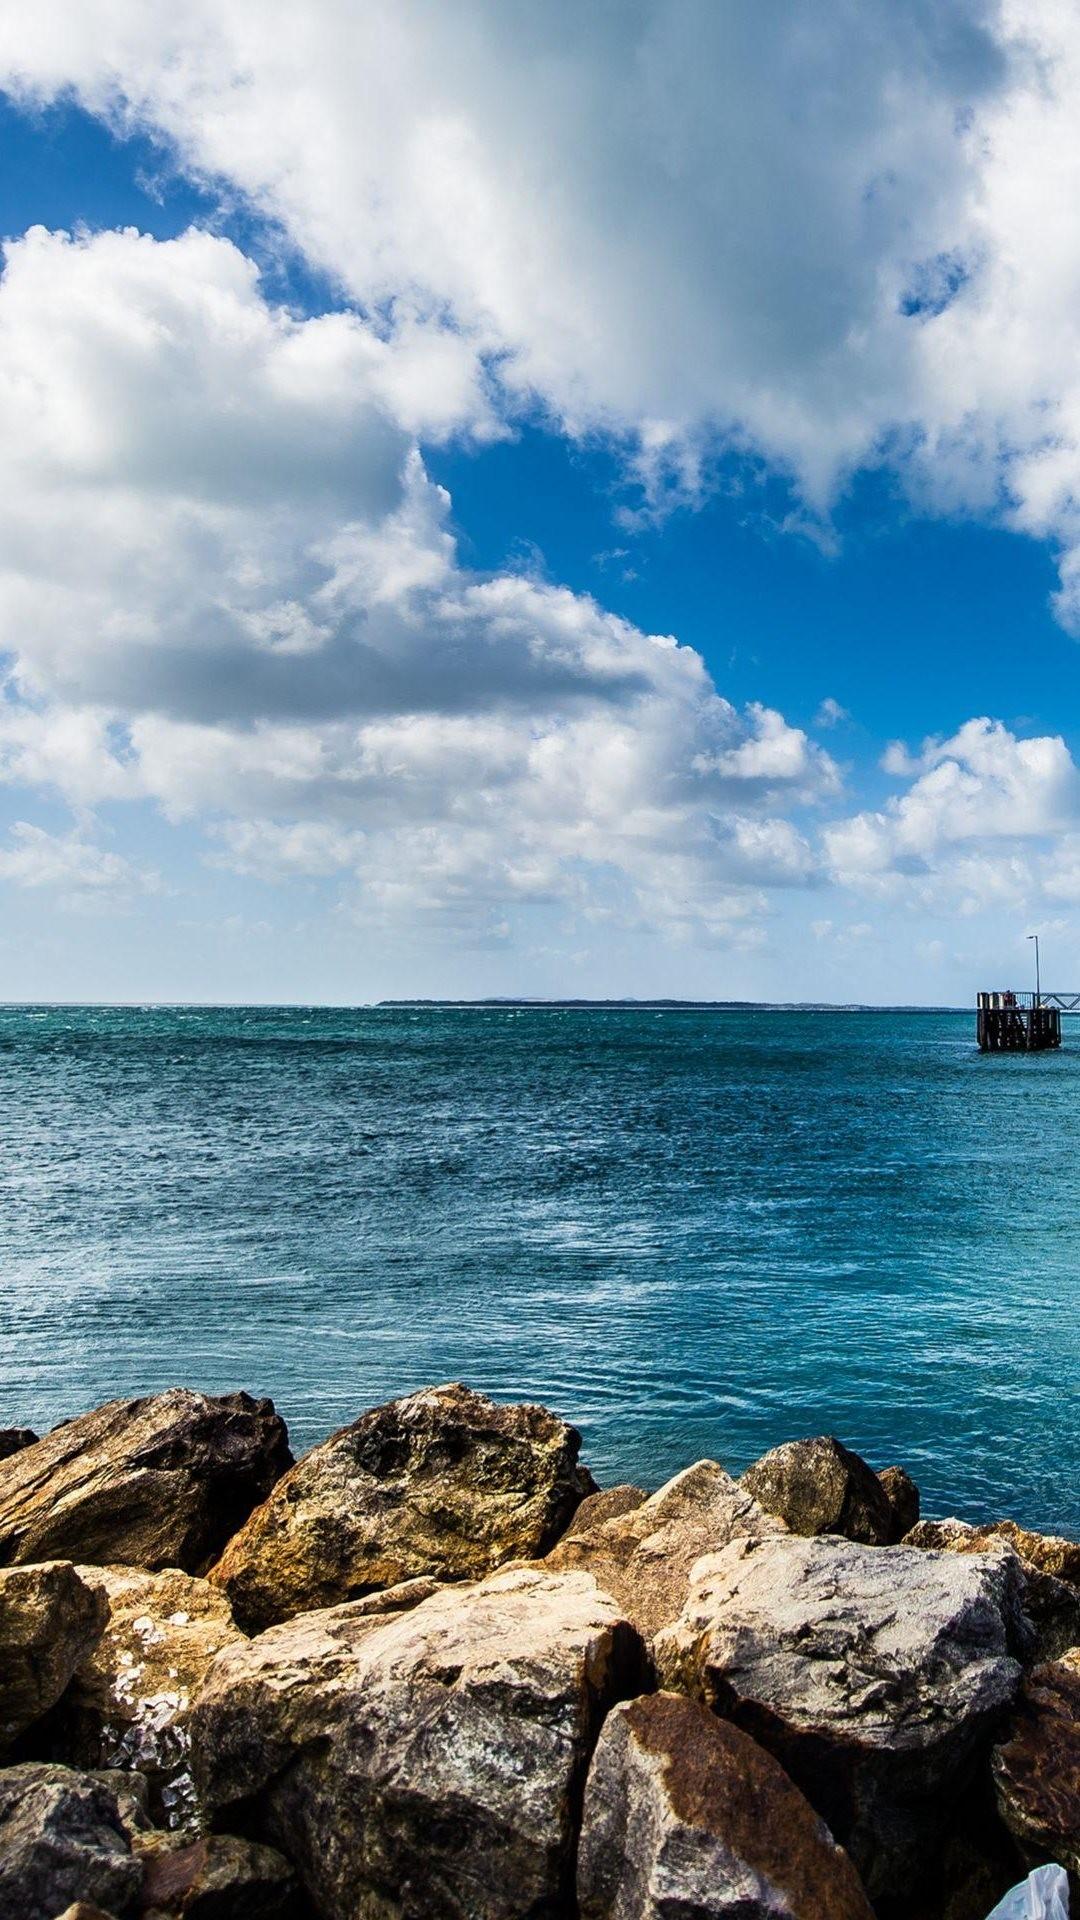 Calm Sea Rocks Lockscreen iPhone 6 Plus HD Wallpaper …